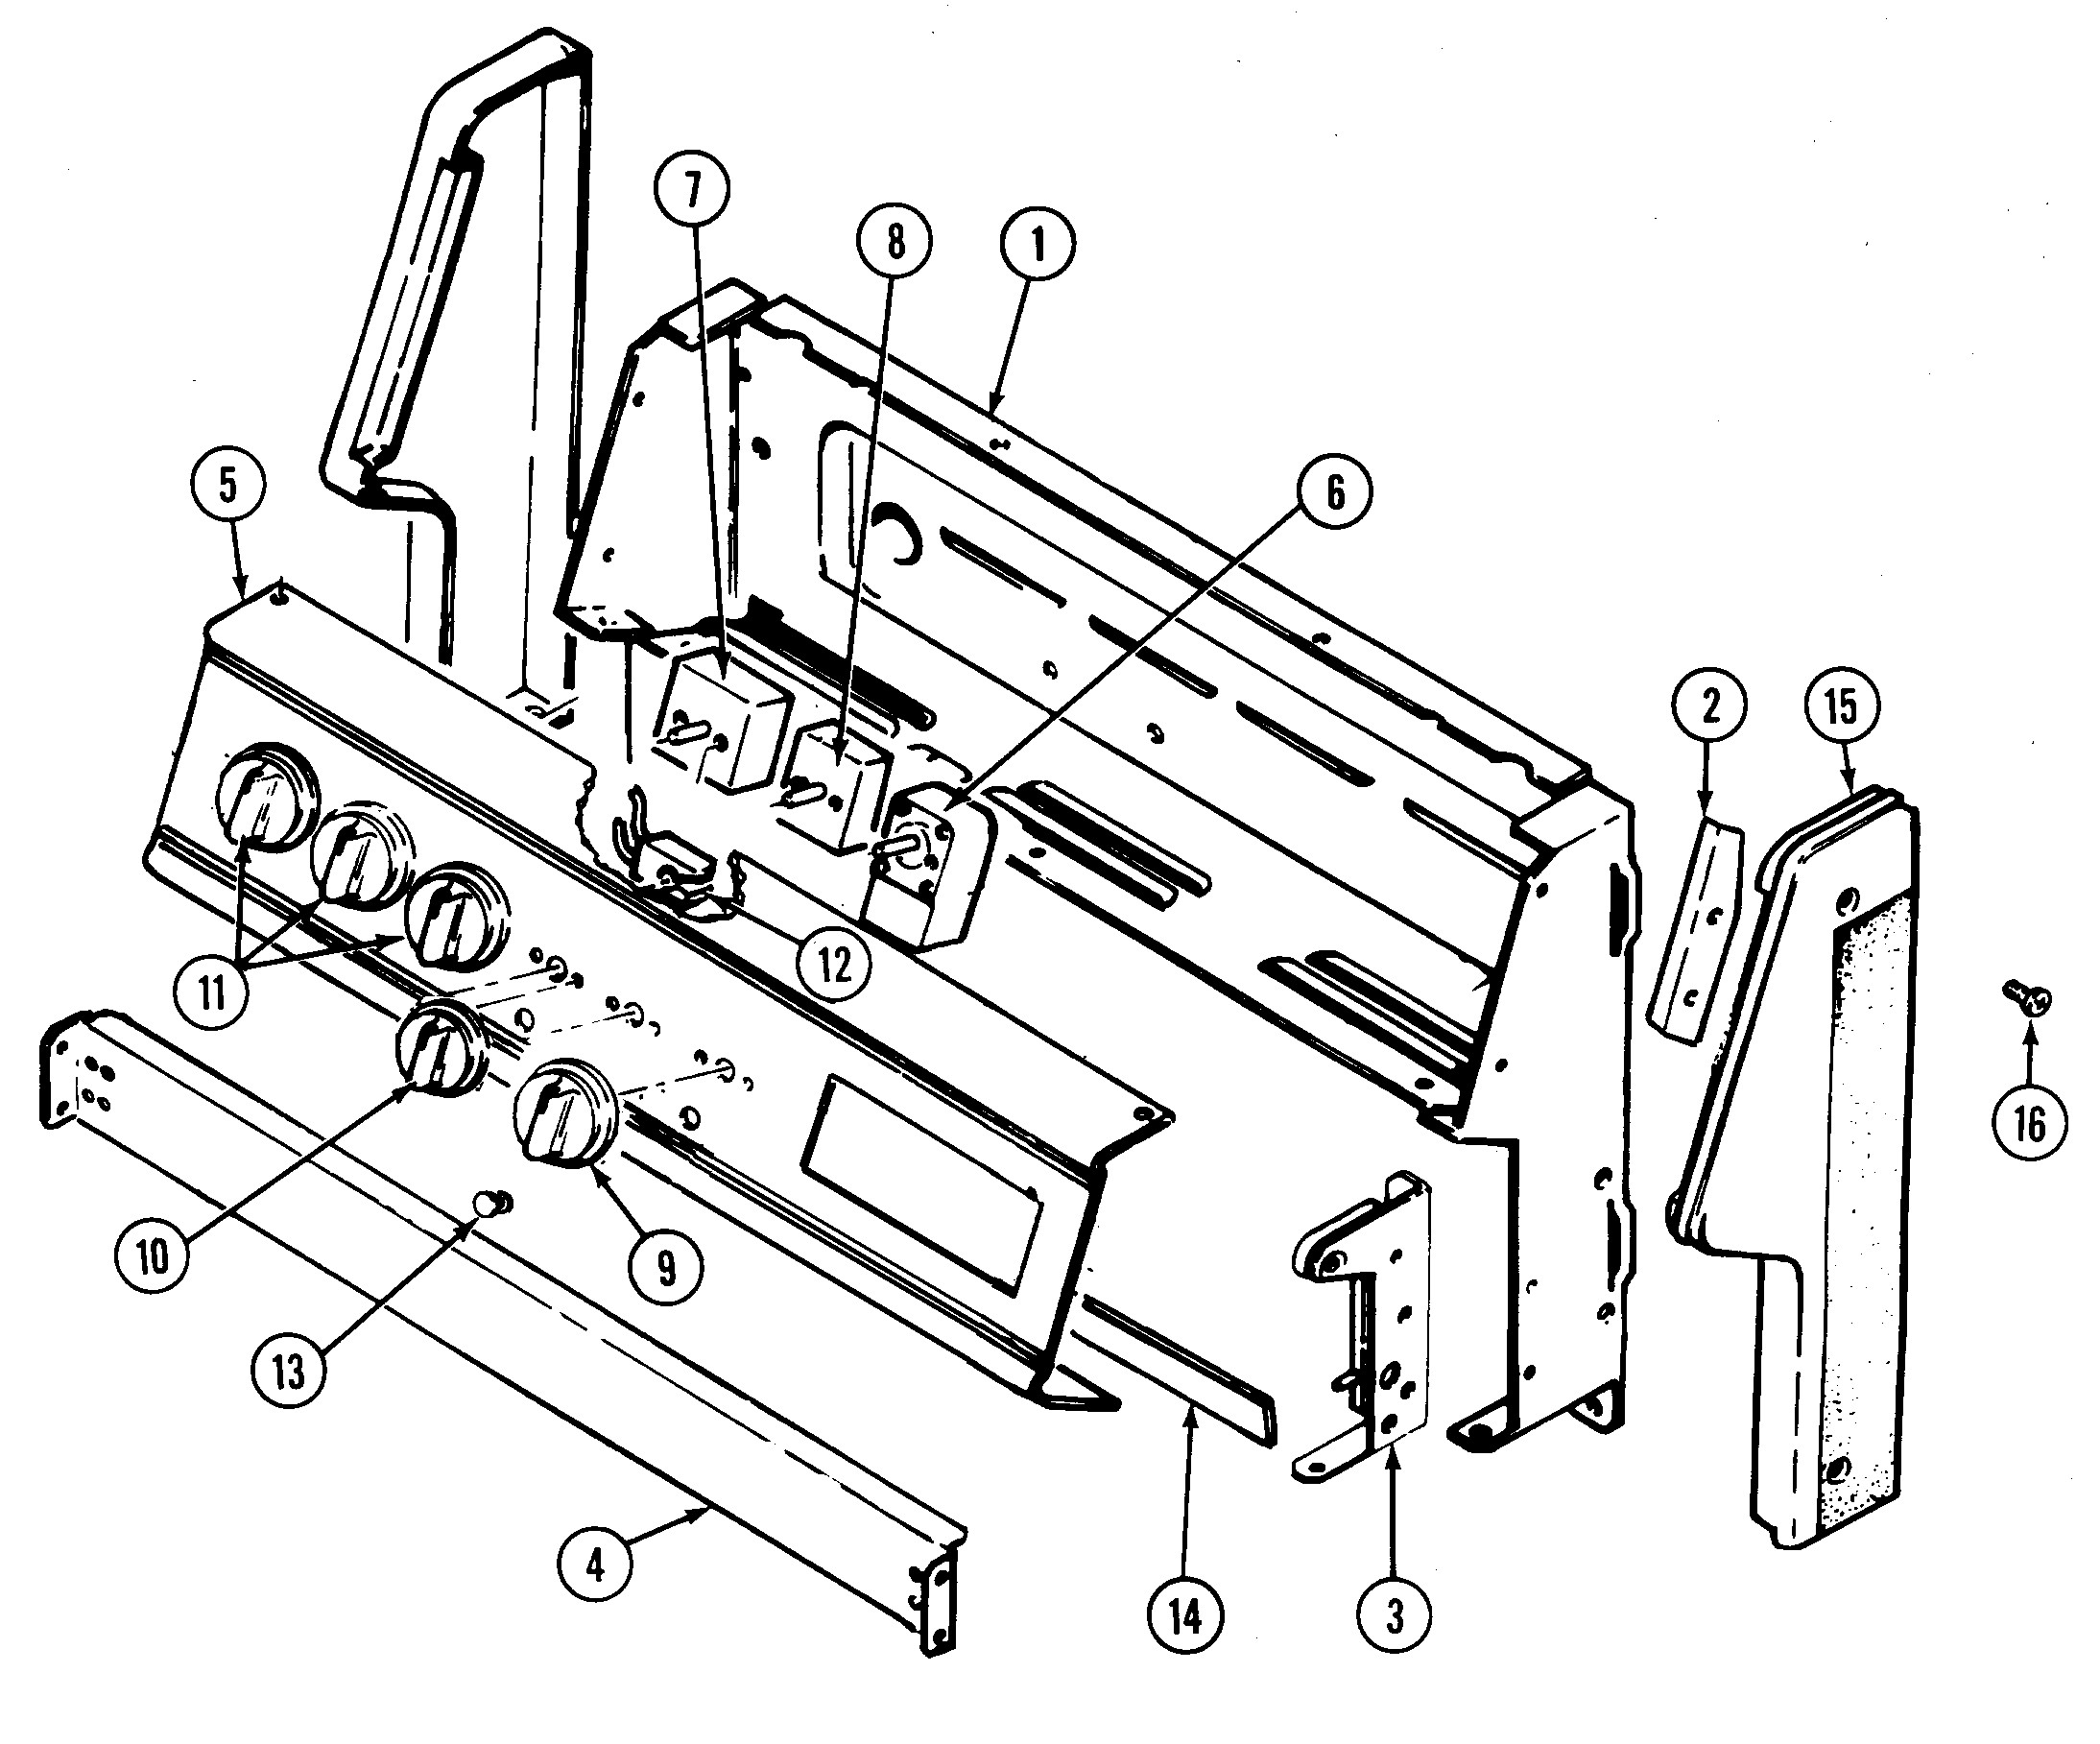 Lawn Mower Wiring Diagram Diagram Lawn Mower Snapper Lawn Mower